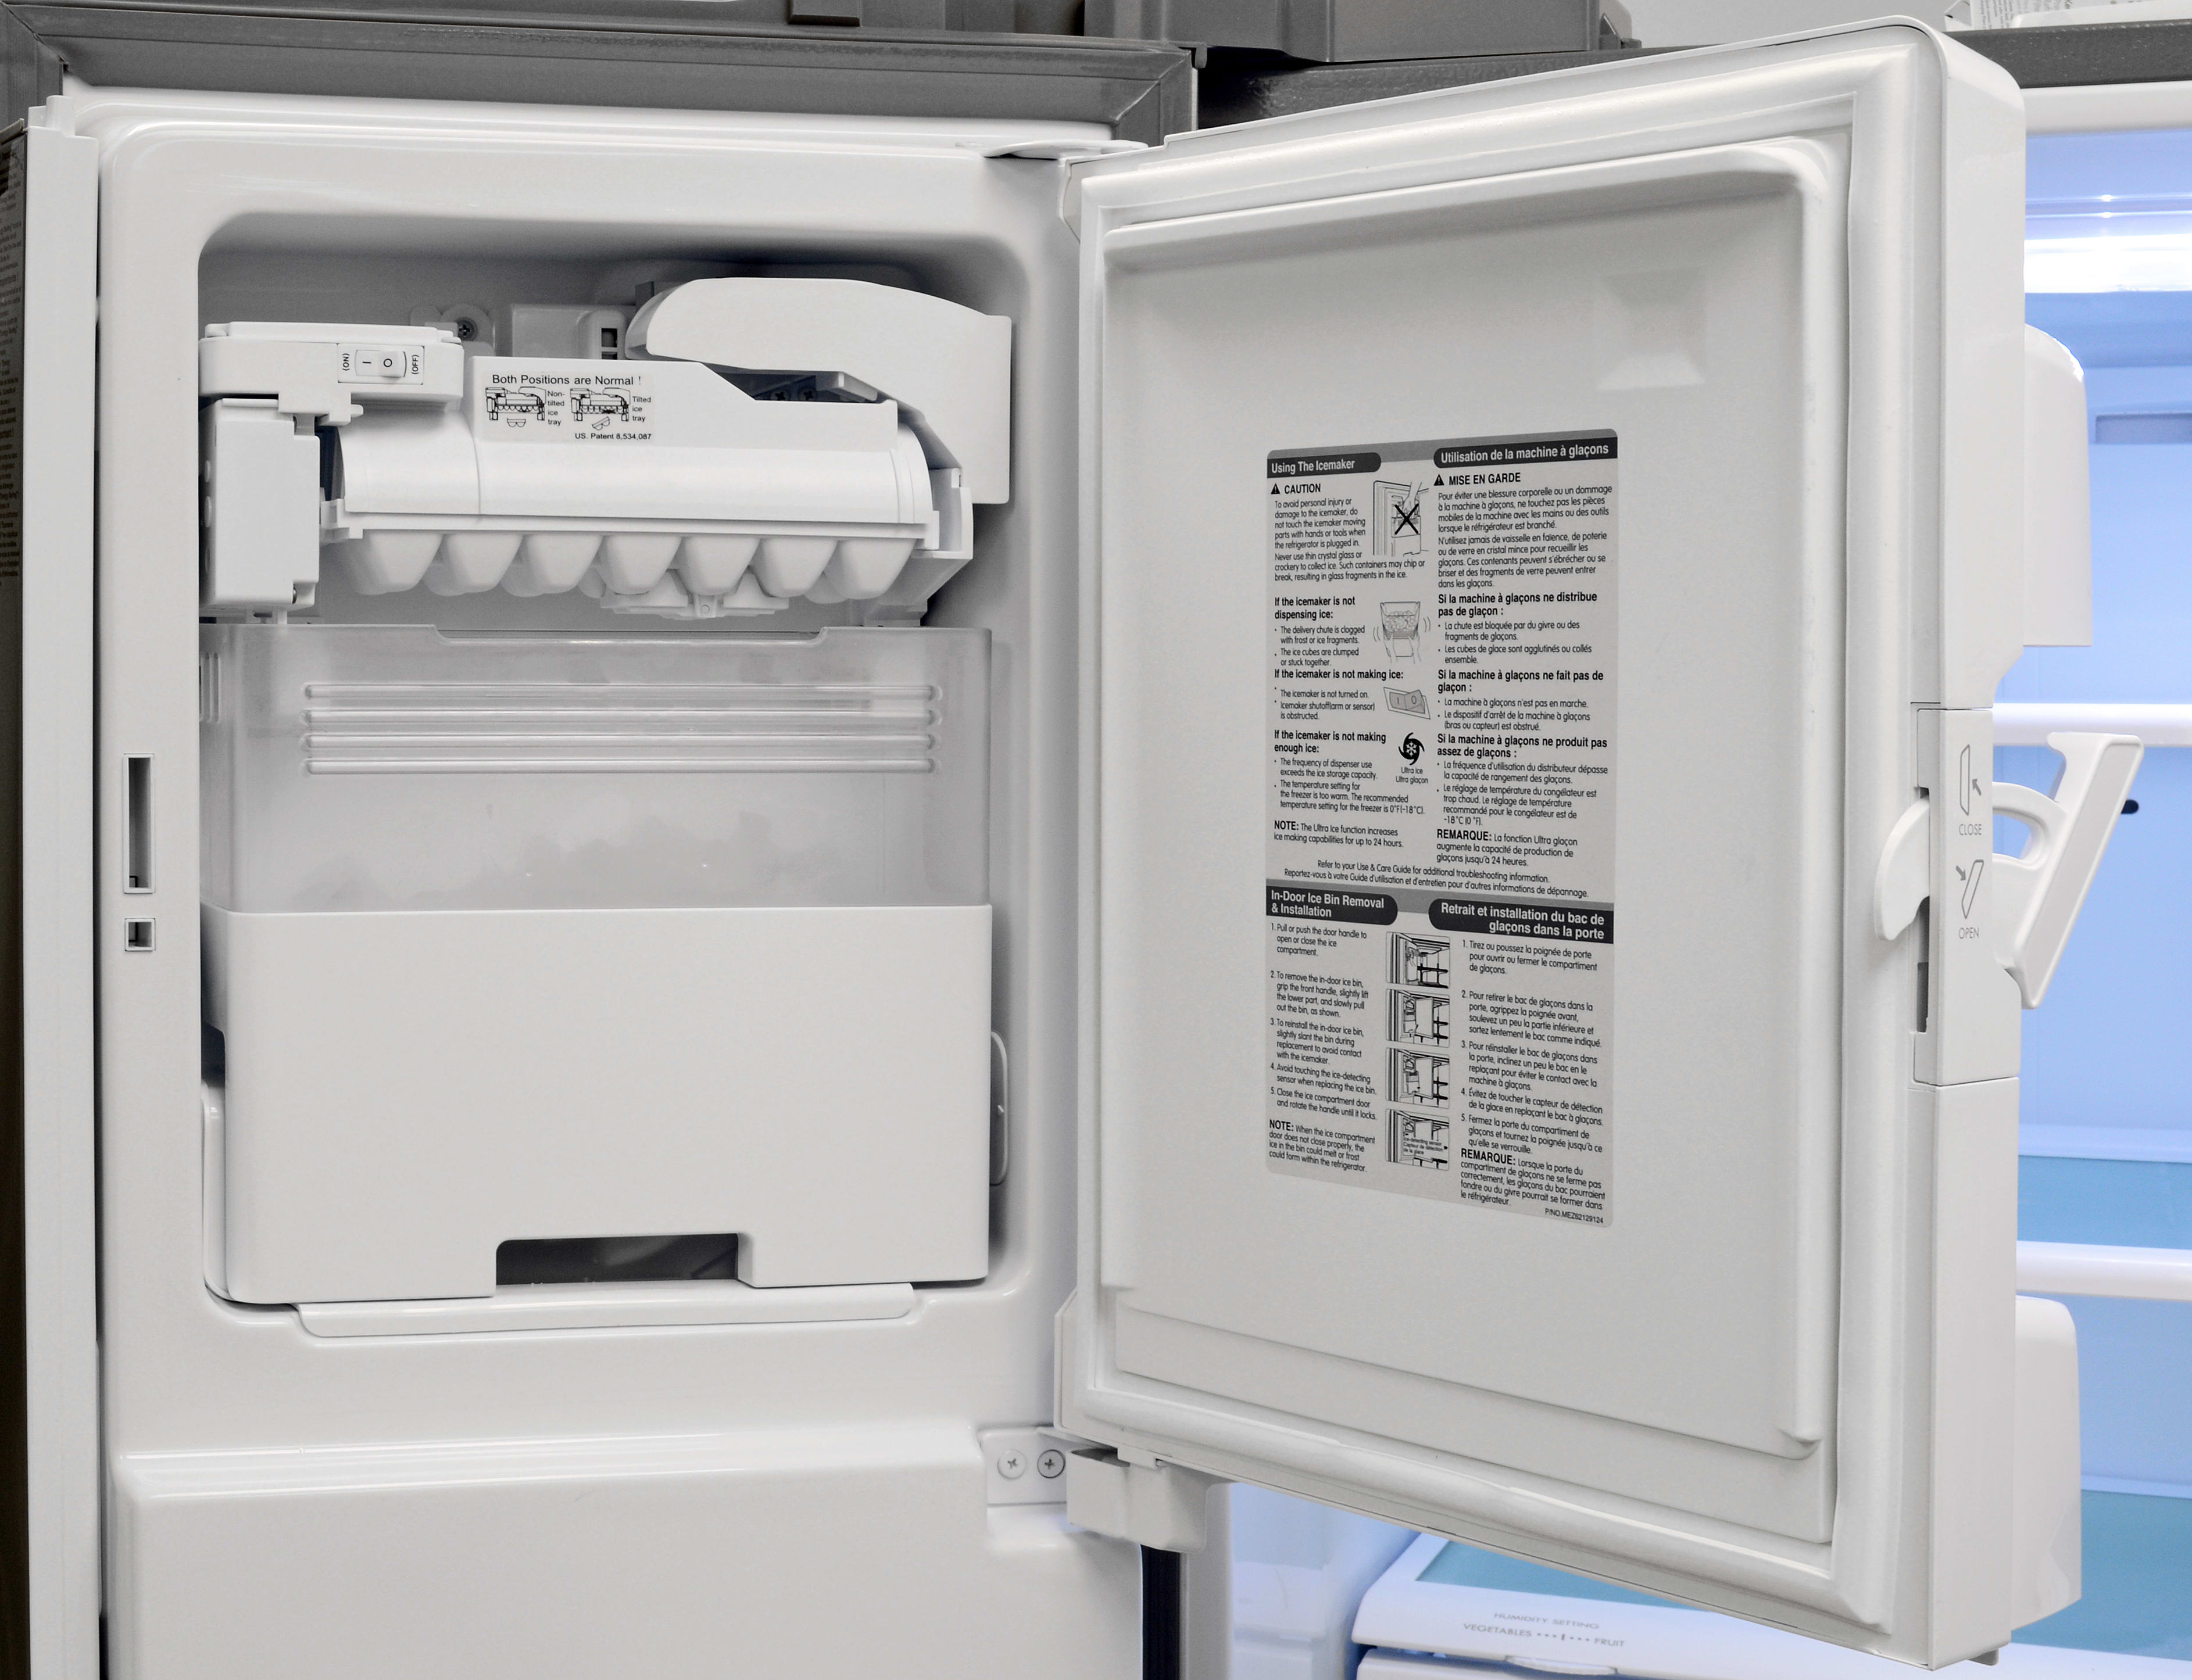 The Kenmore 70333's door-mounted icemaker is both capacious and efficiently hidden away.